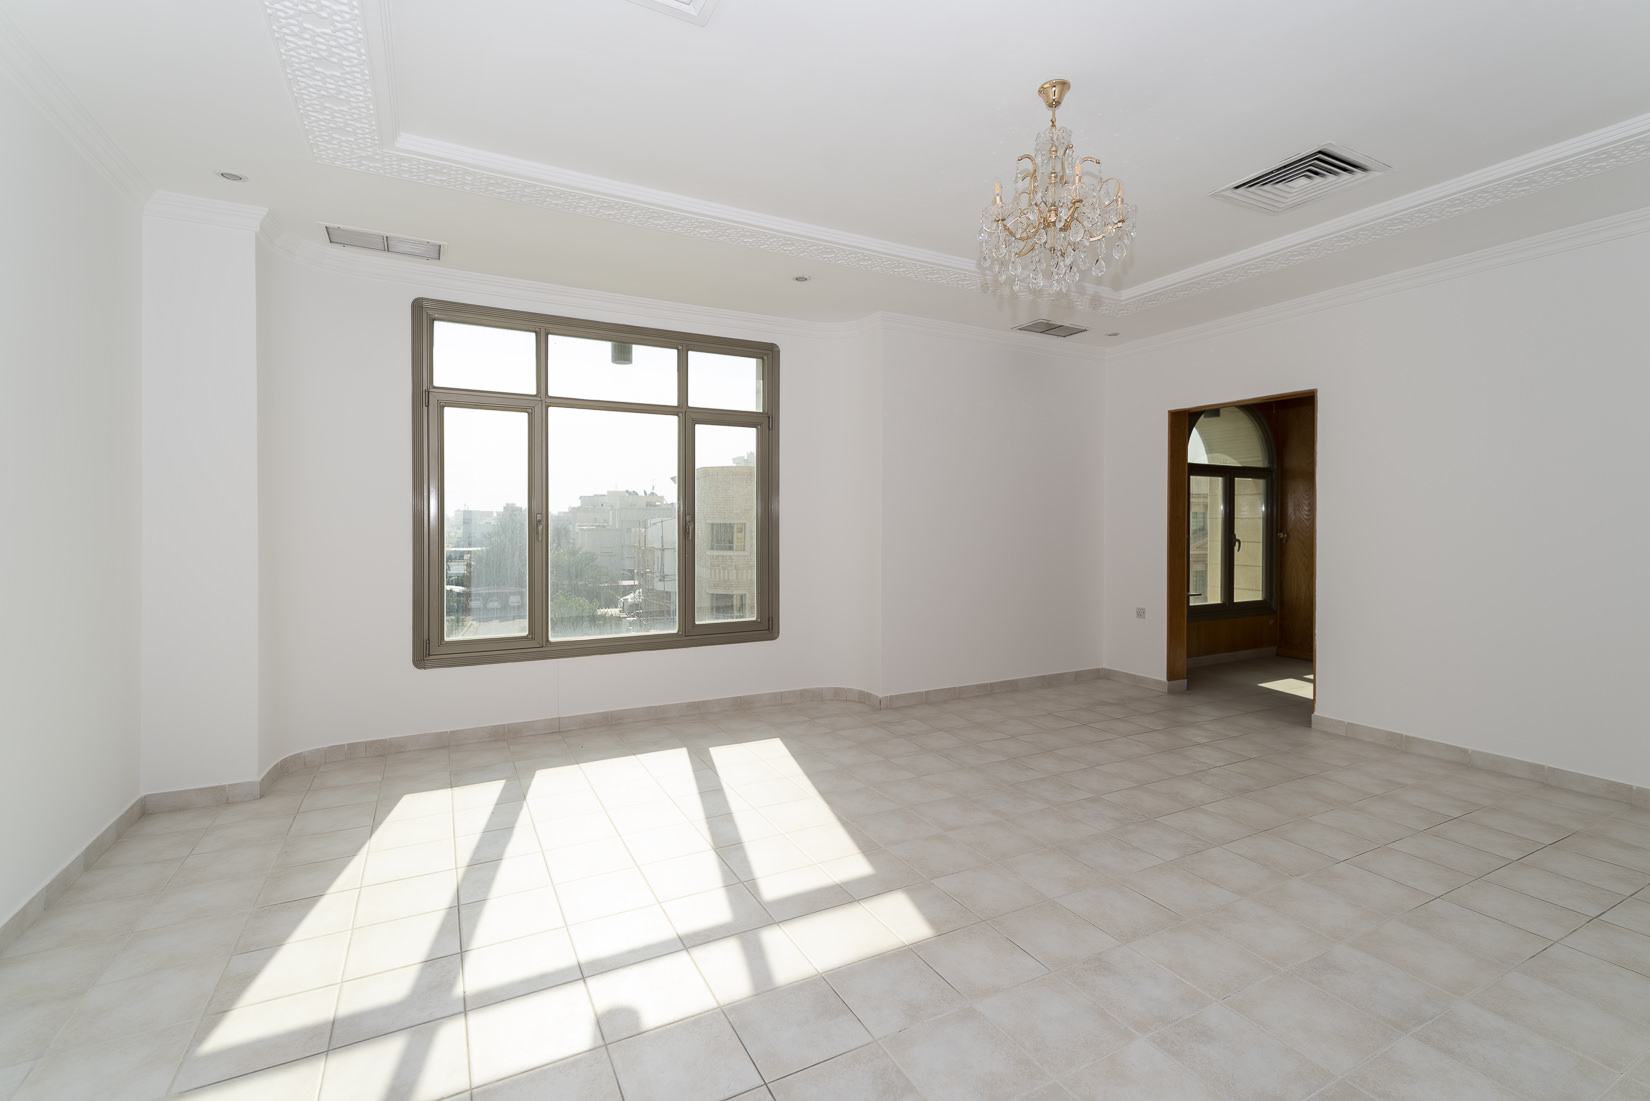 Adan – spacious, older, four bedroom floor